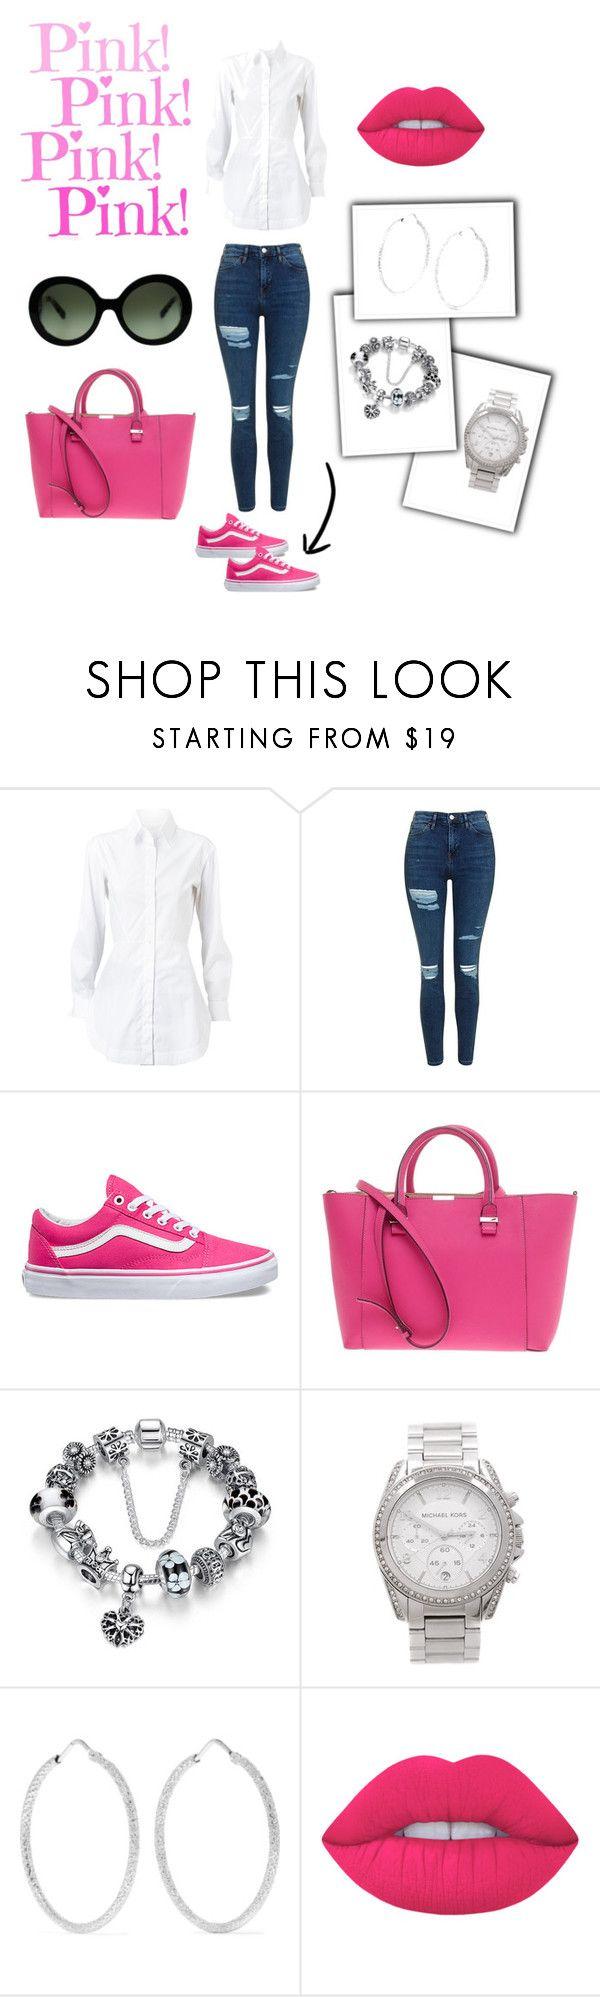 We love pink! by nicolemtnez on Polyvore featuring moda, Alaïa, Topshop, Vans, Victoria Beckham, Carolina Bucci, Michael Kors, Prada and Lime Crime